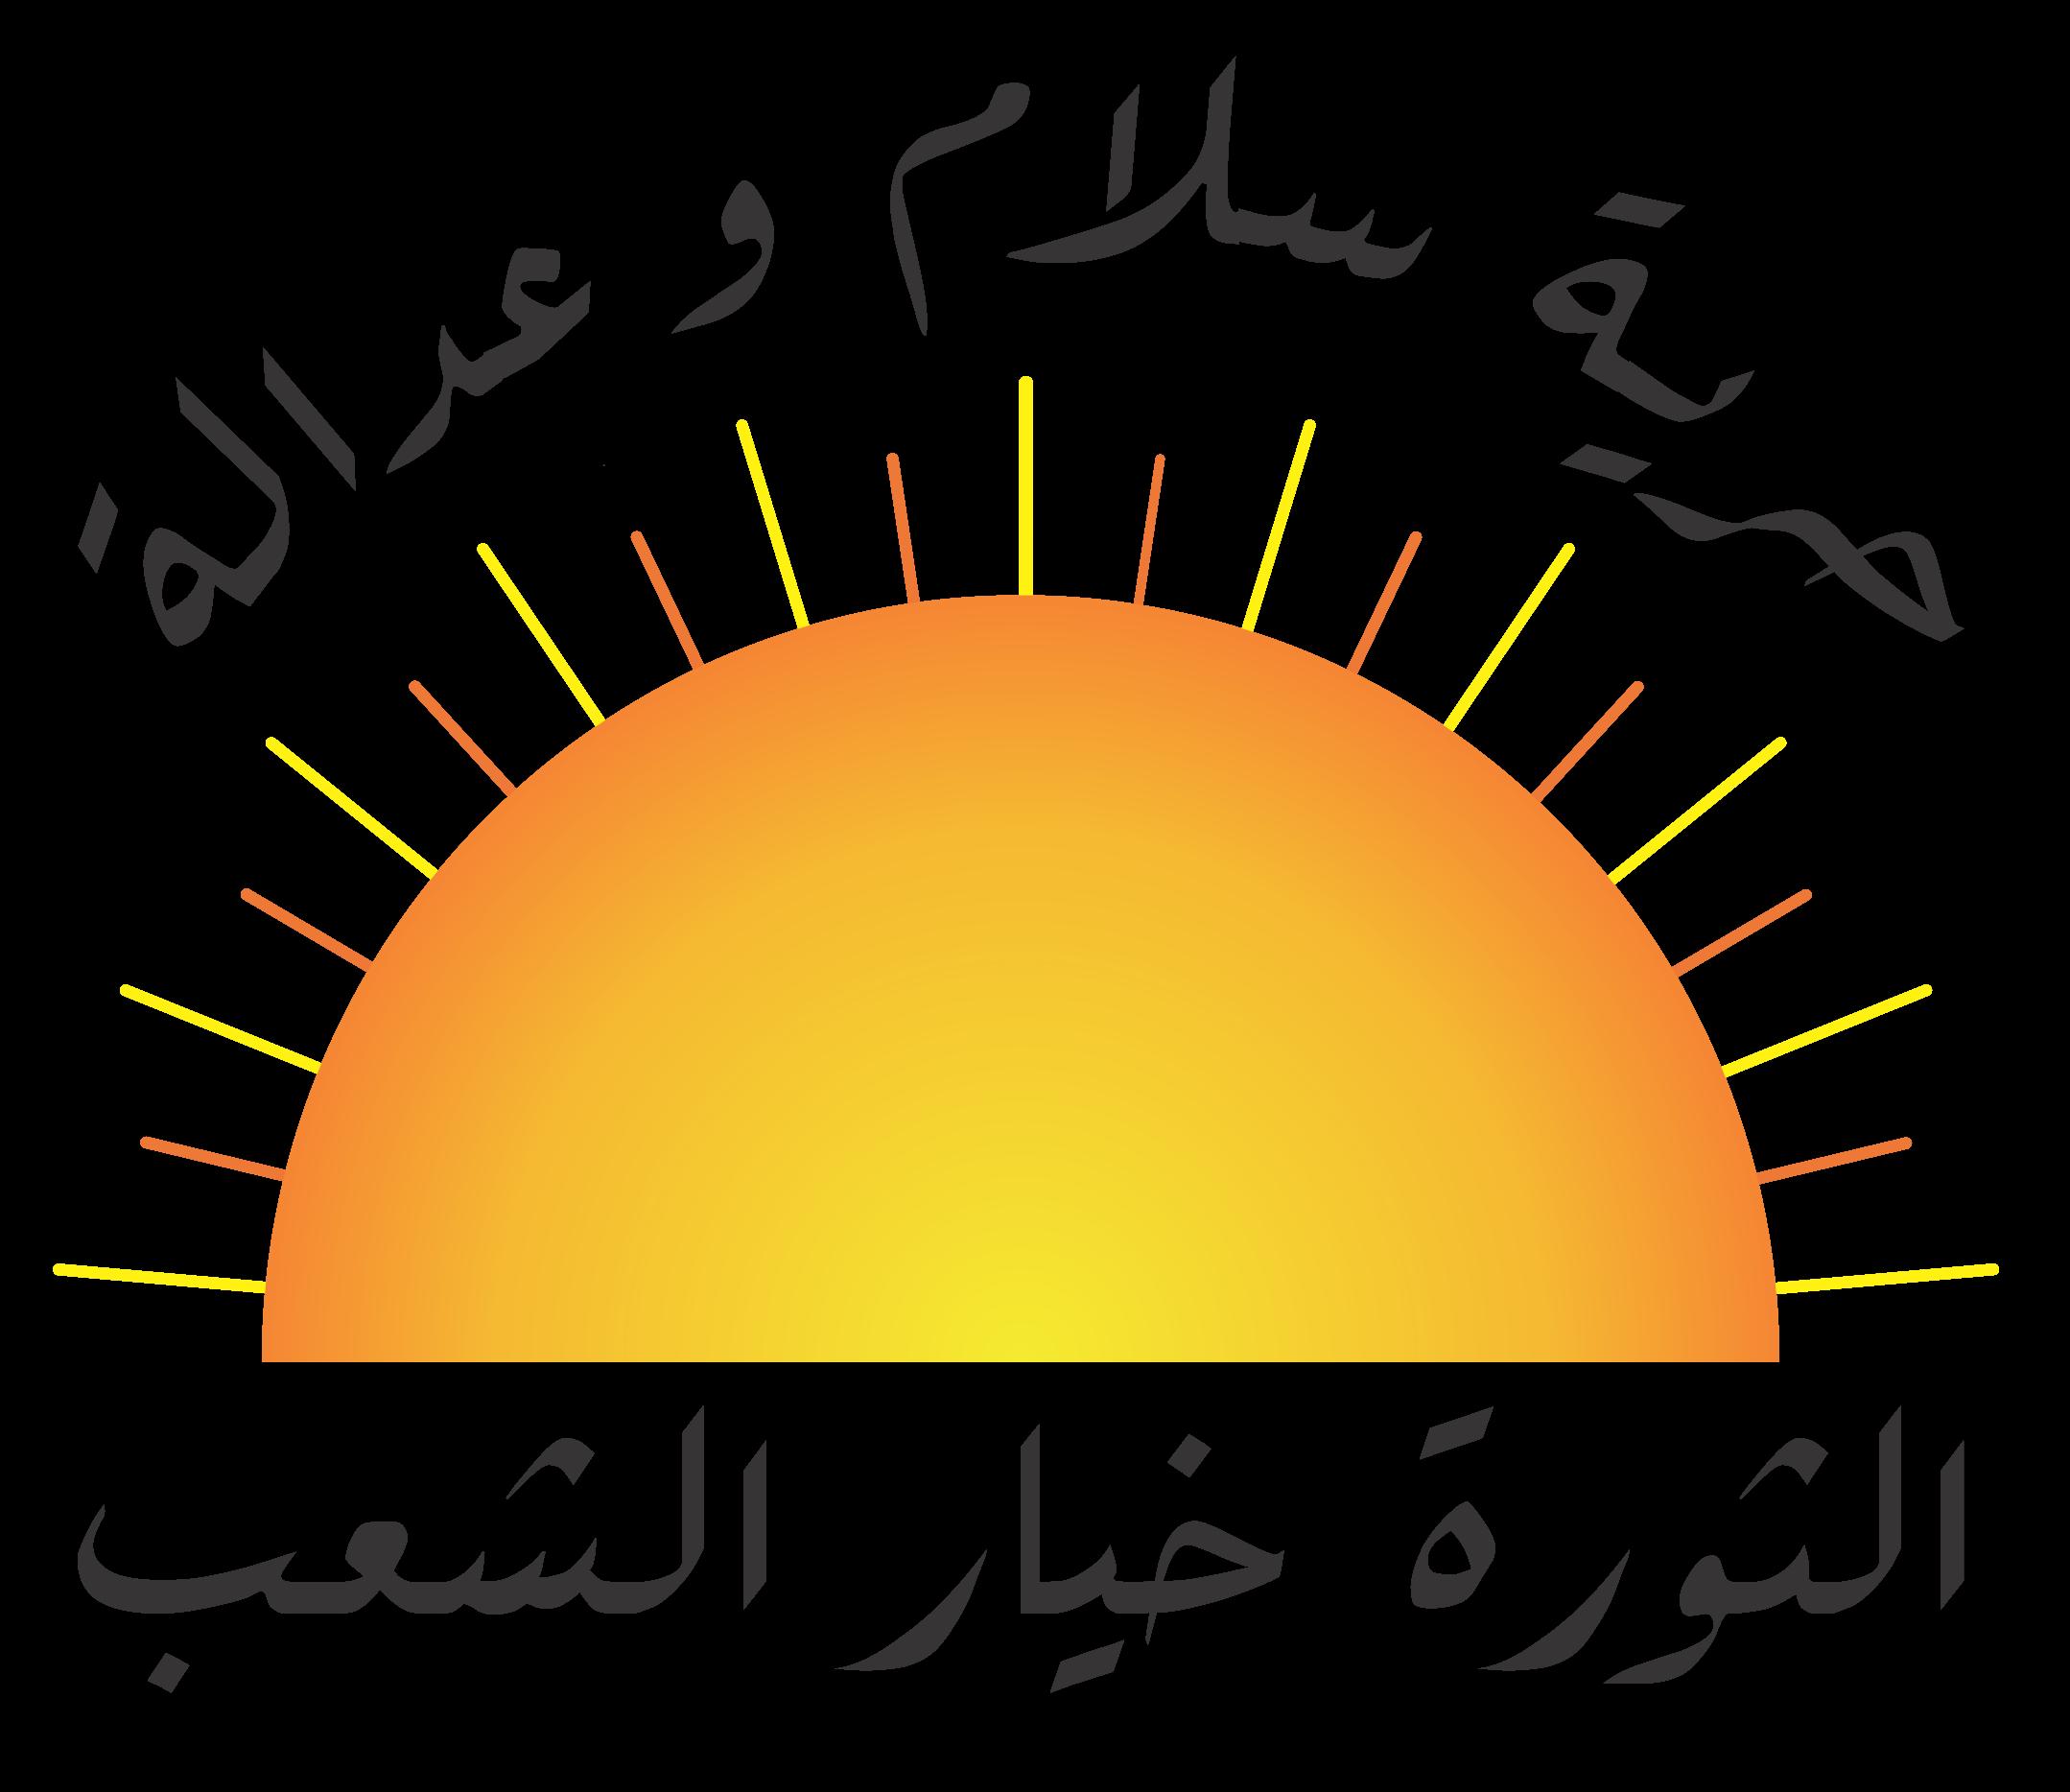 SUDAN-UPRISINGS.ORG